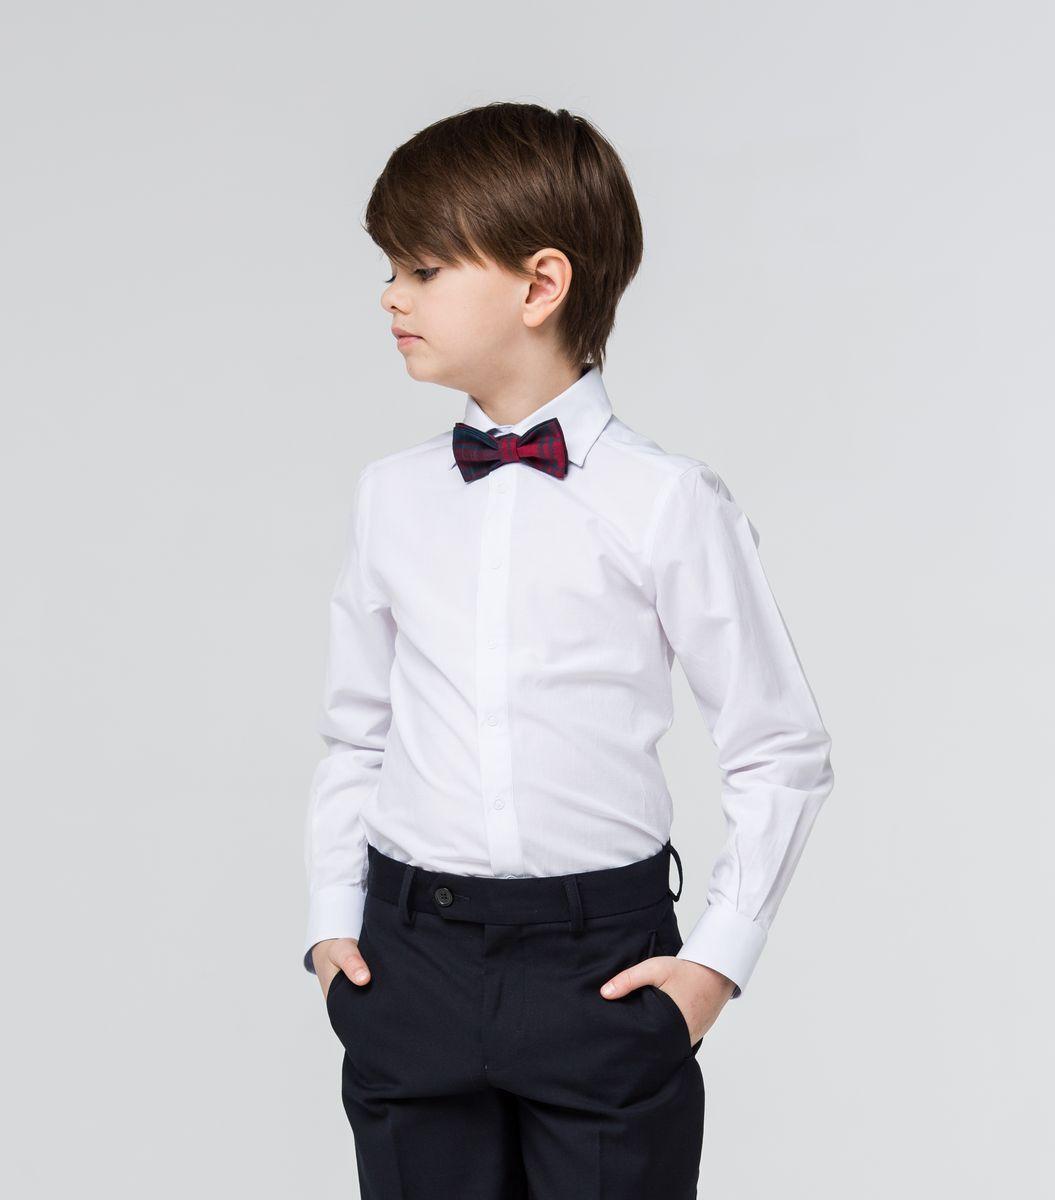 Рубашка для мальчика. SSFSB-629-13831-299SSFSB-629-13831-299